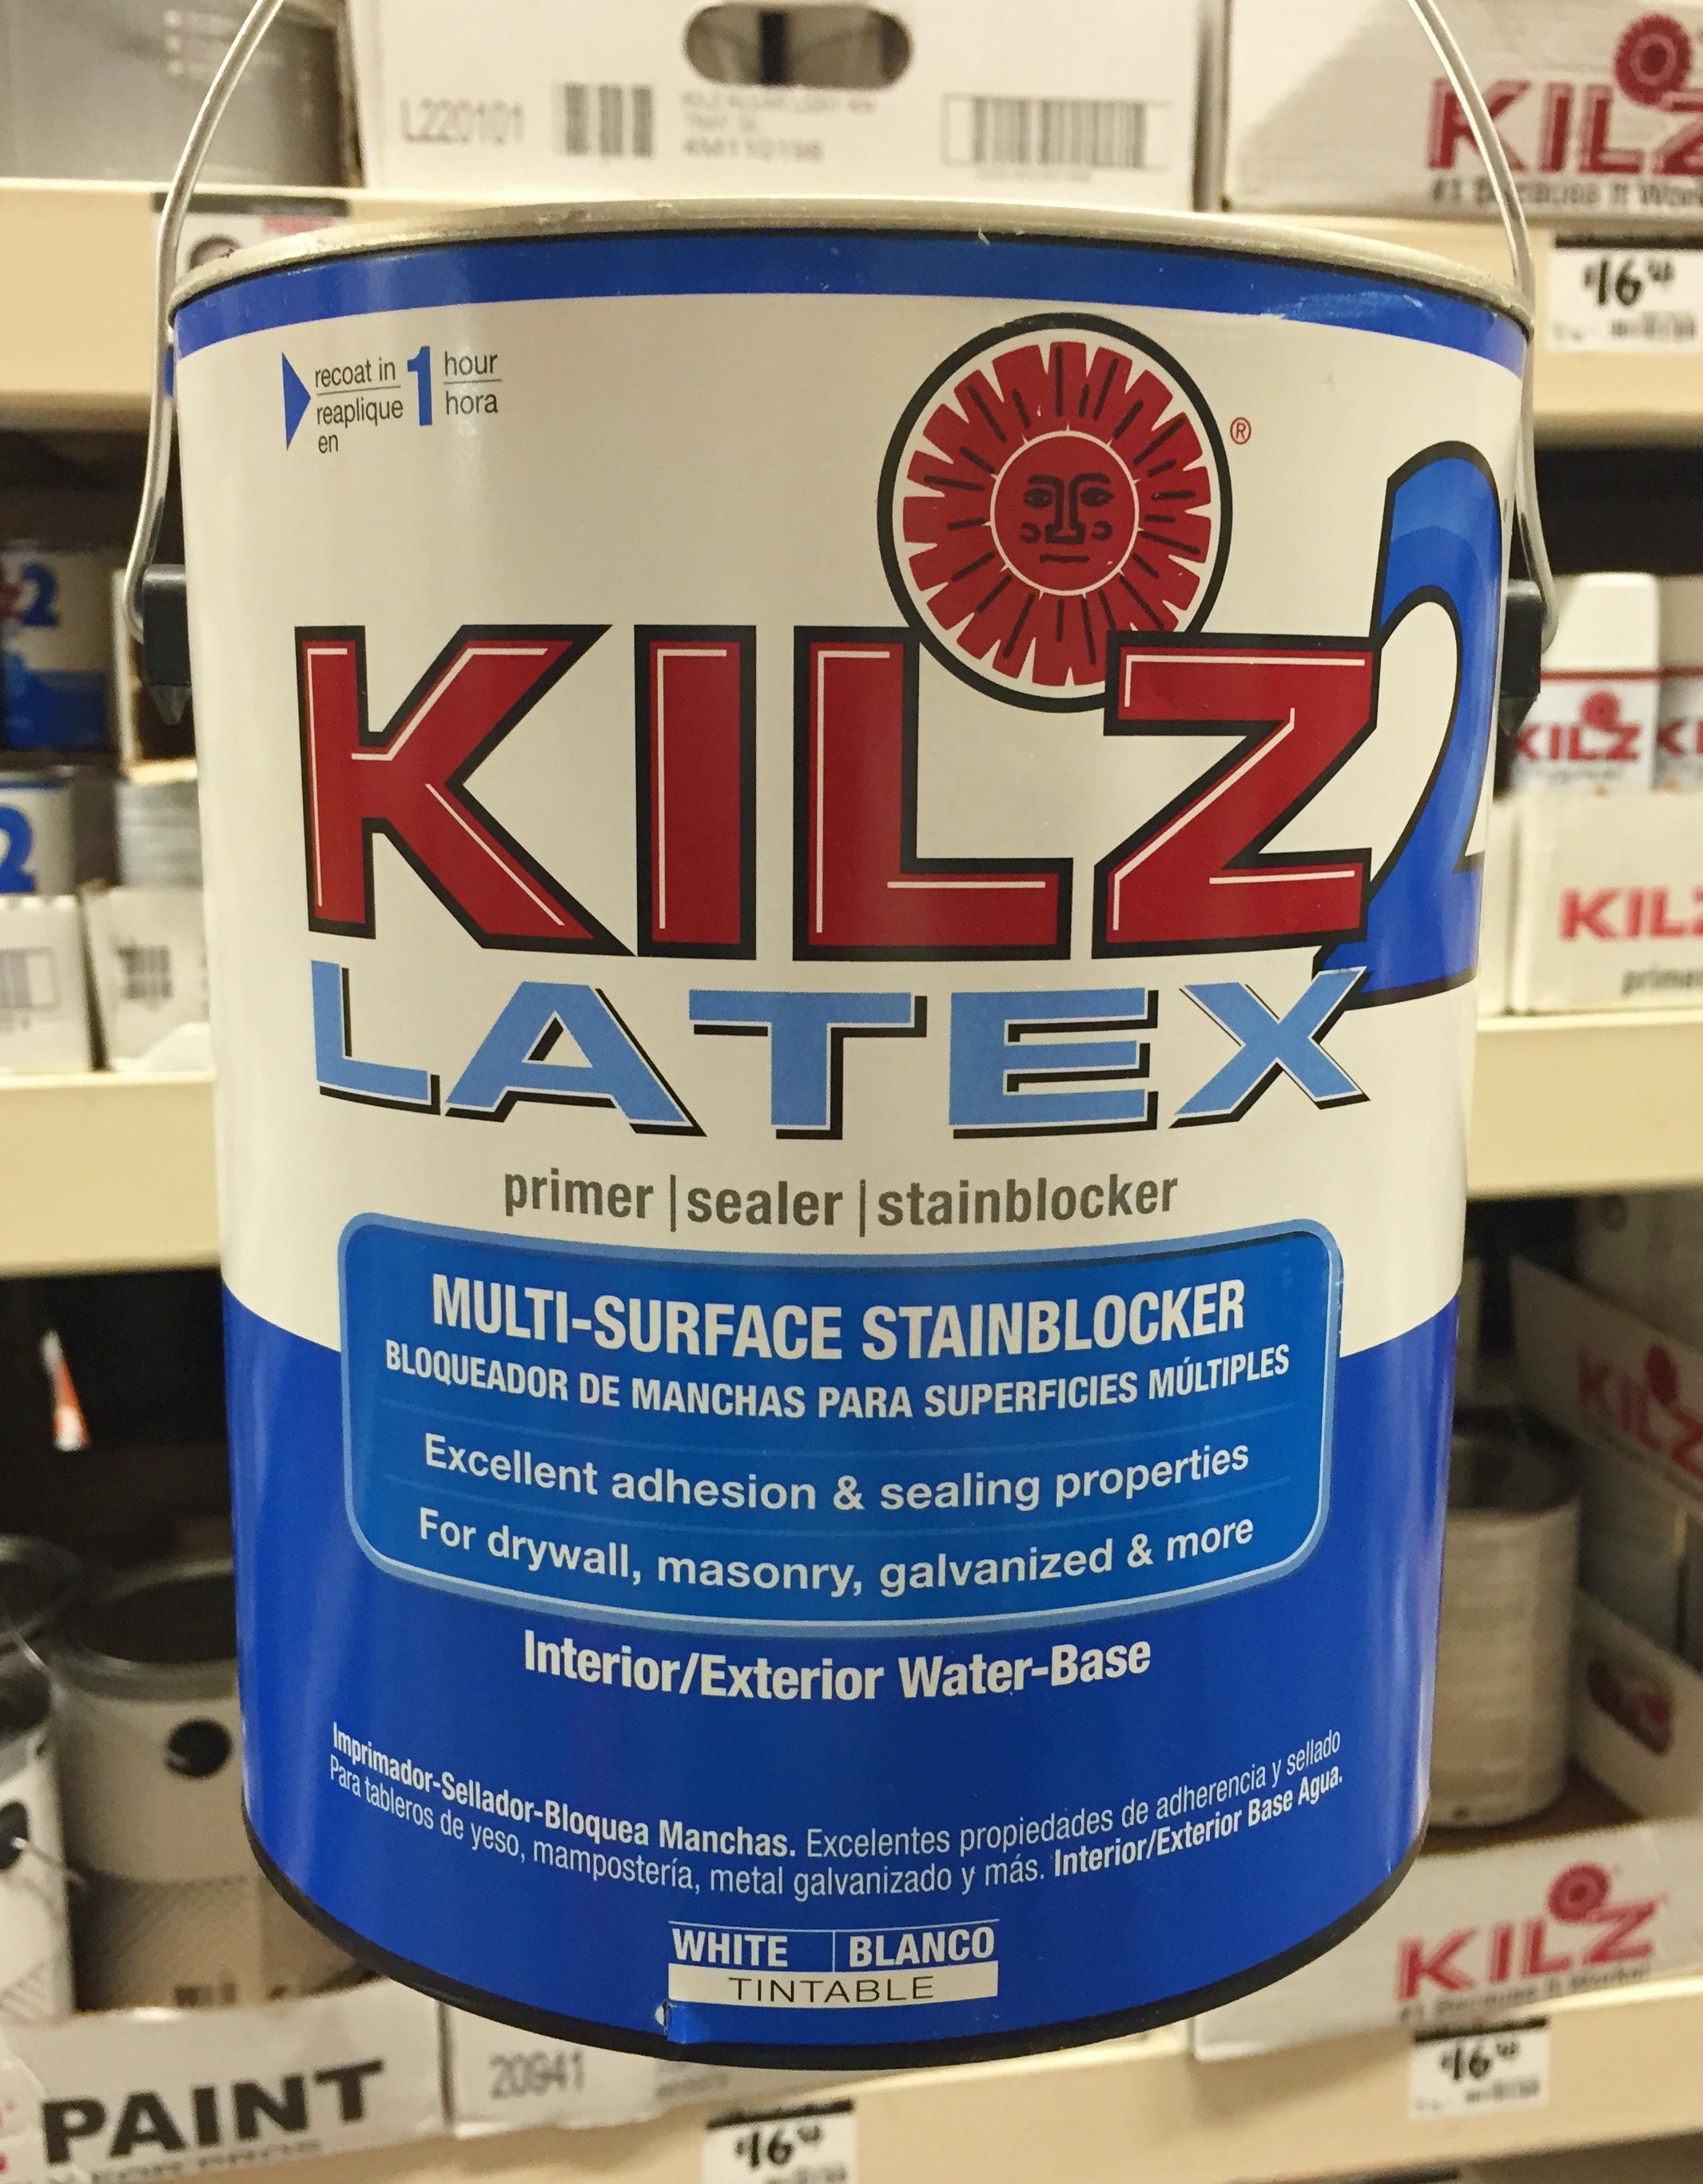 Kilz bathroom ceiling paint - Kilz Latex Primer Image Number 19 Of Kilz Bathroom Ceiling Paint